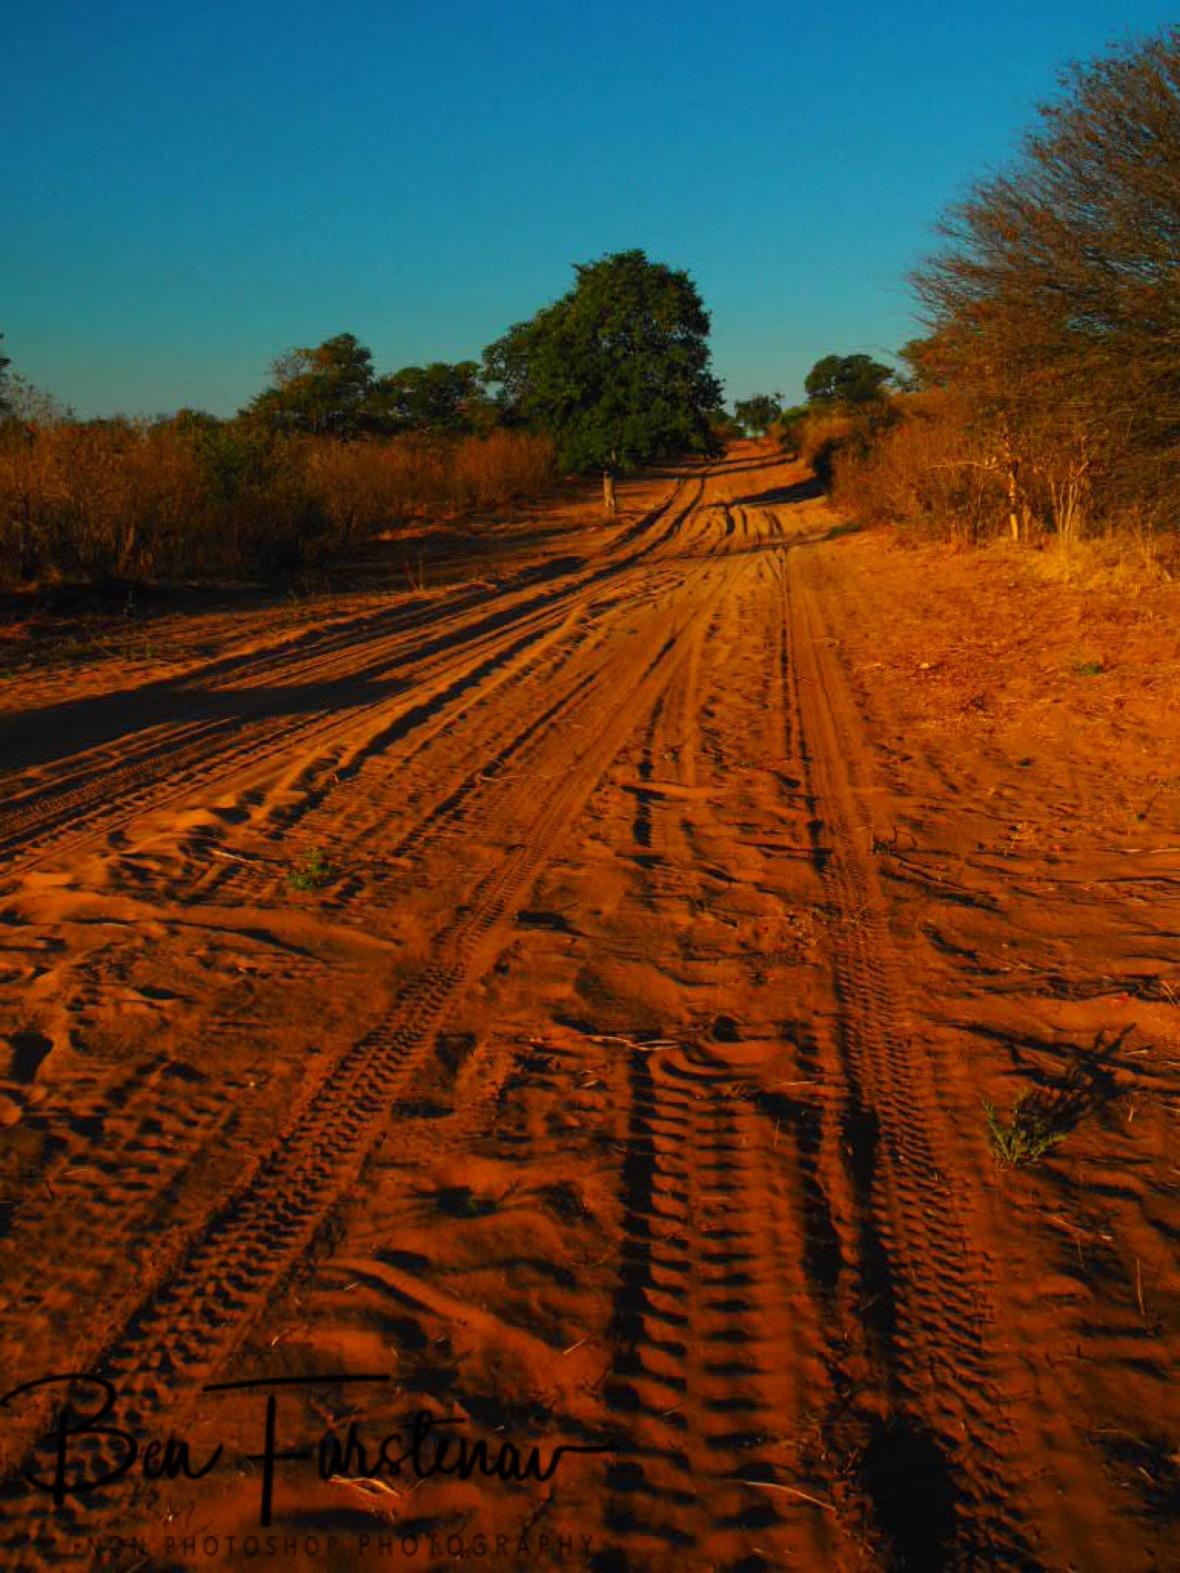 Outback track, Chobe National Park, Botswana